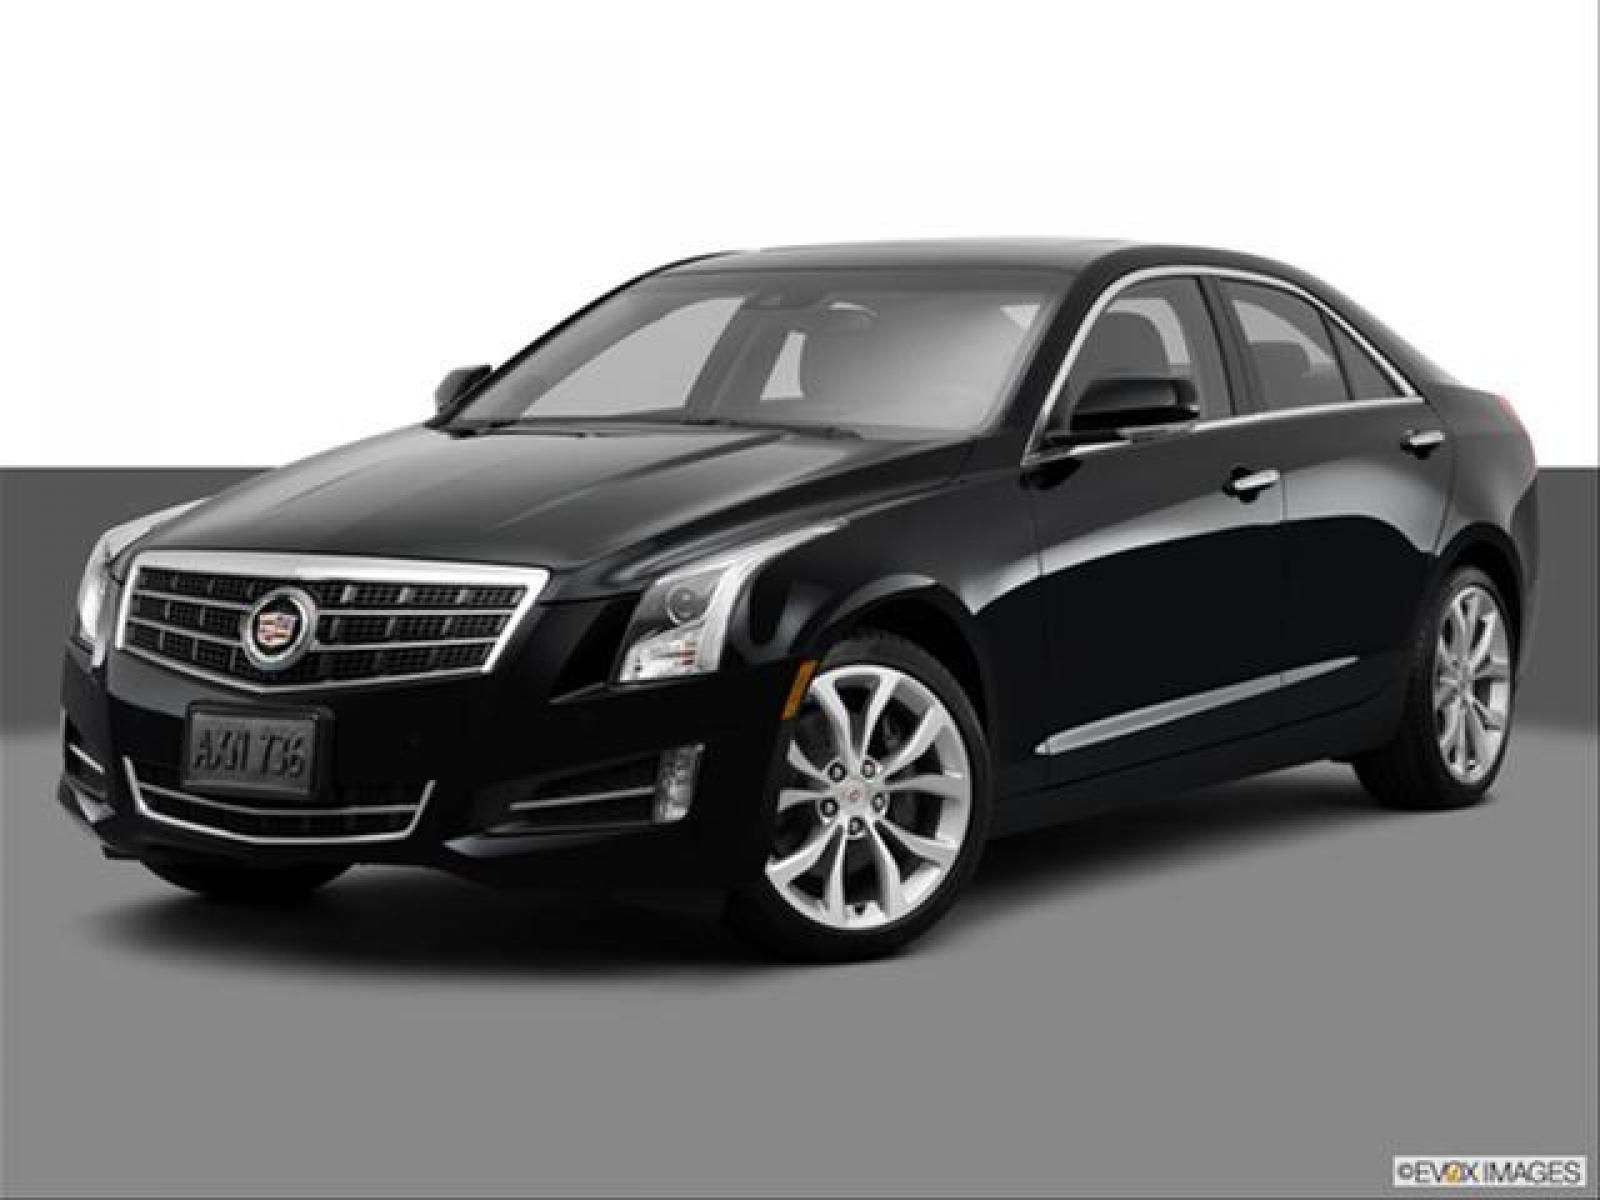 2014 Cadillac ATS - Information and photos - ZombieDrive